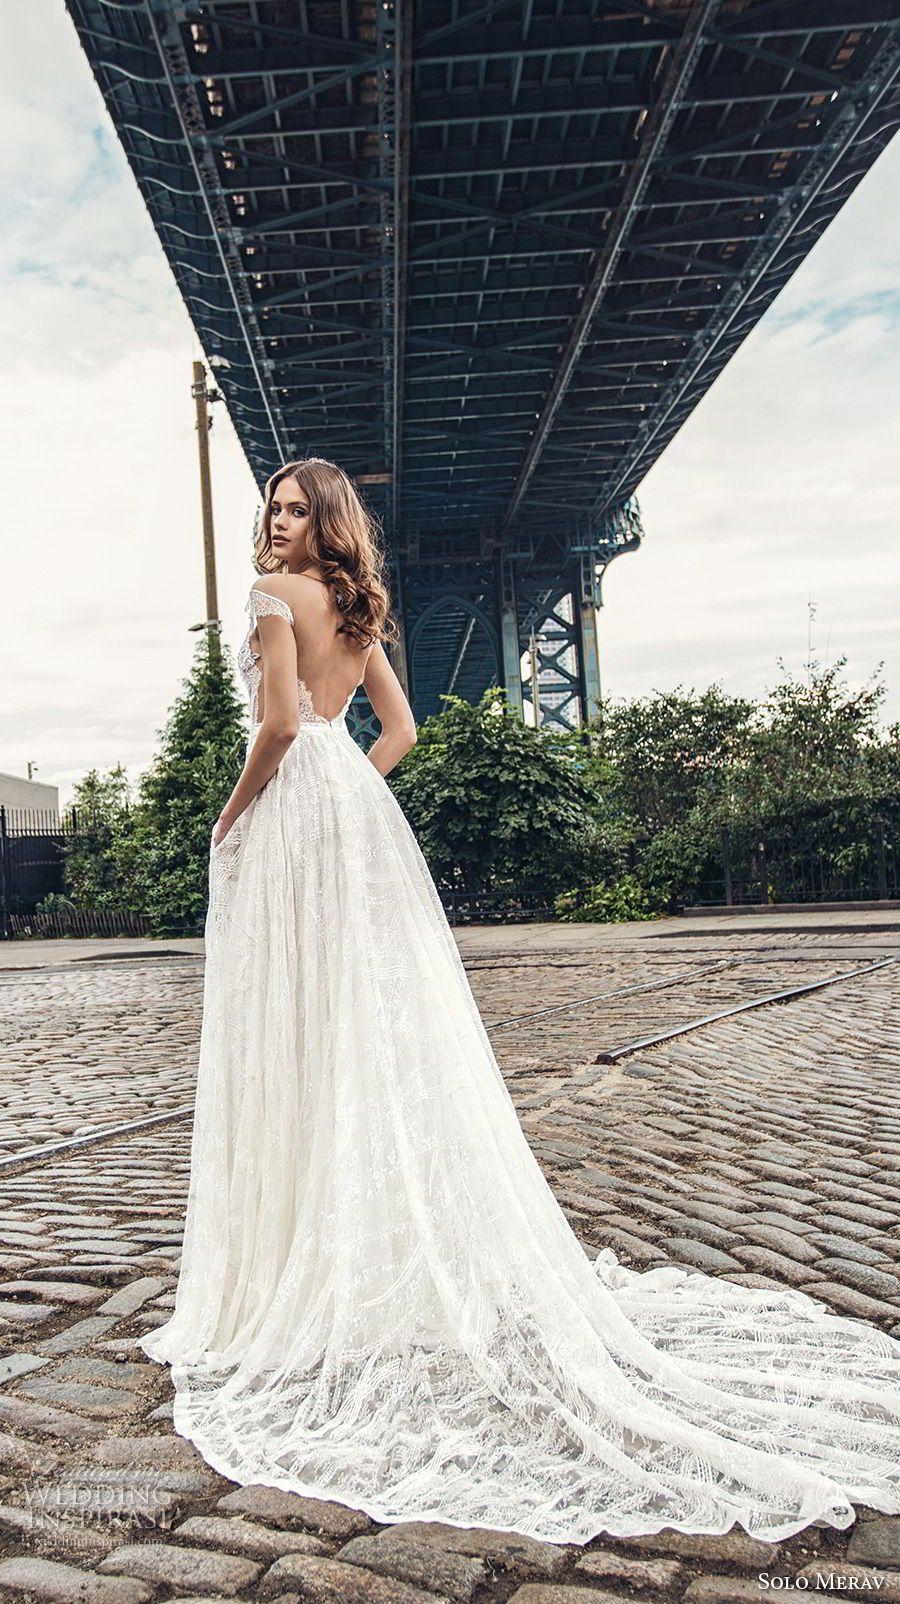 Solo merav wedding dresses u ucwhite princessud bridal collection